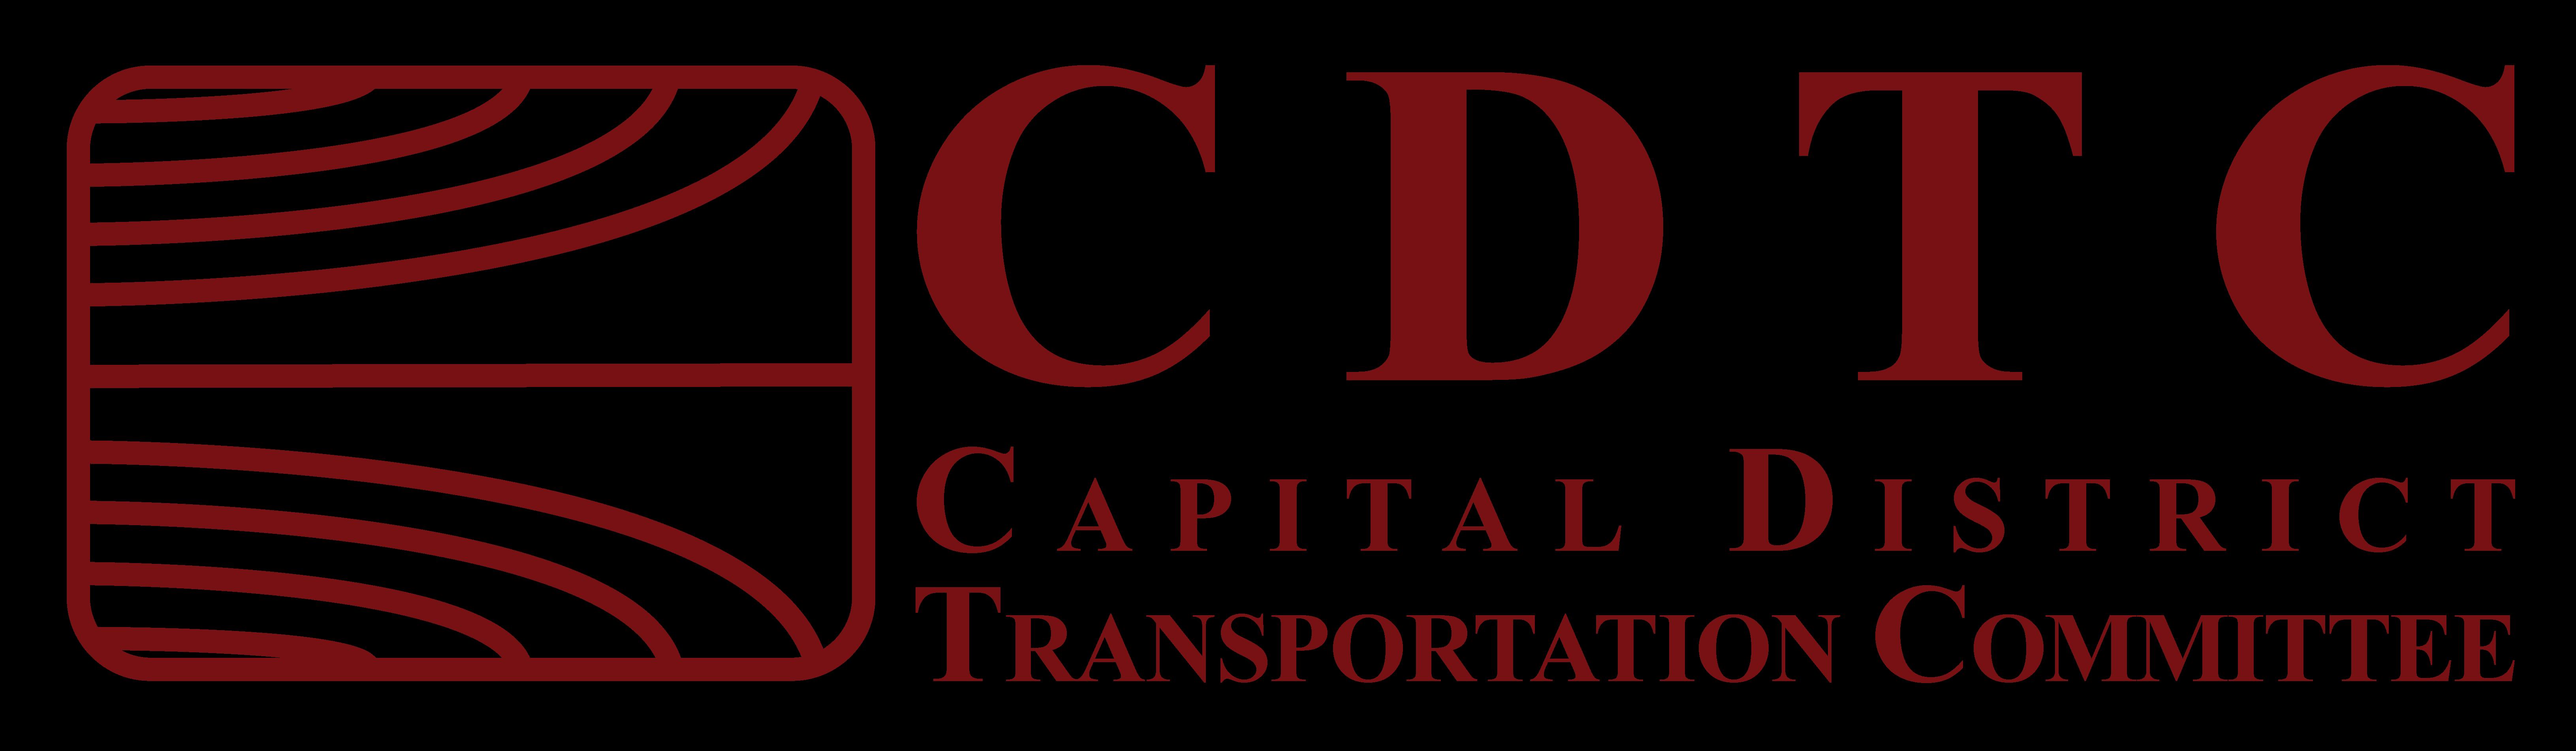 CDTC - Capital District Transportation Committee - Logo